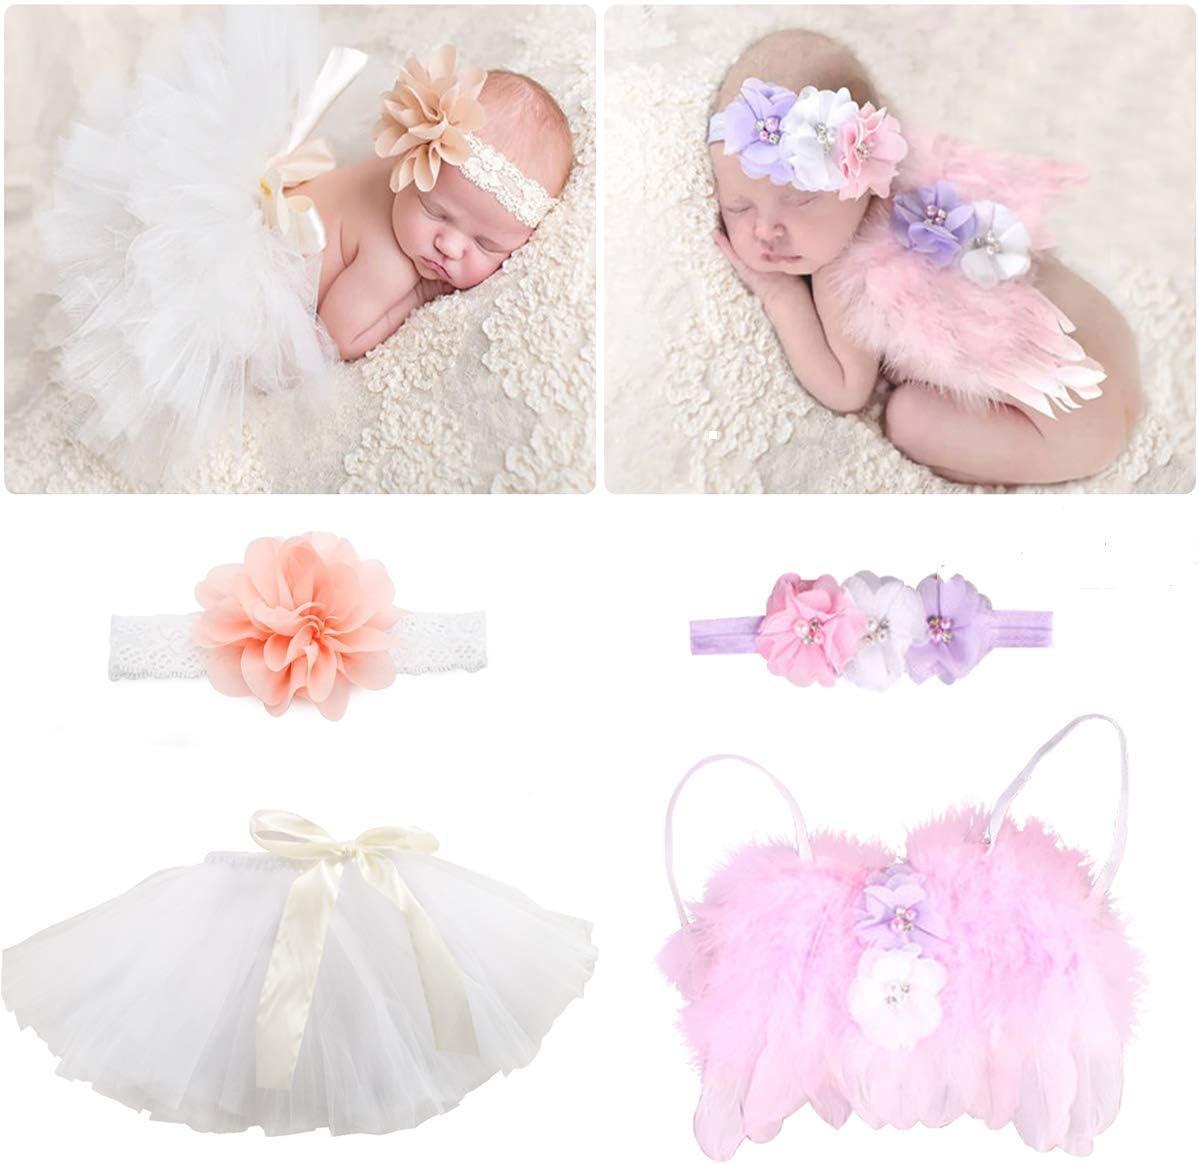 4 PCS Newborn 2021 model Photography 2021 Props Outfits-BabyTutu Skirt Bow Cute